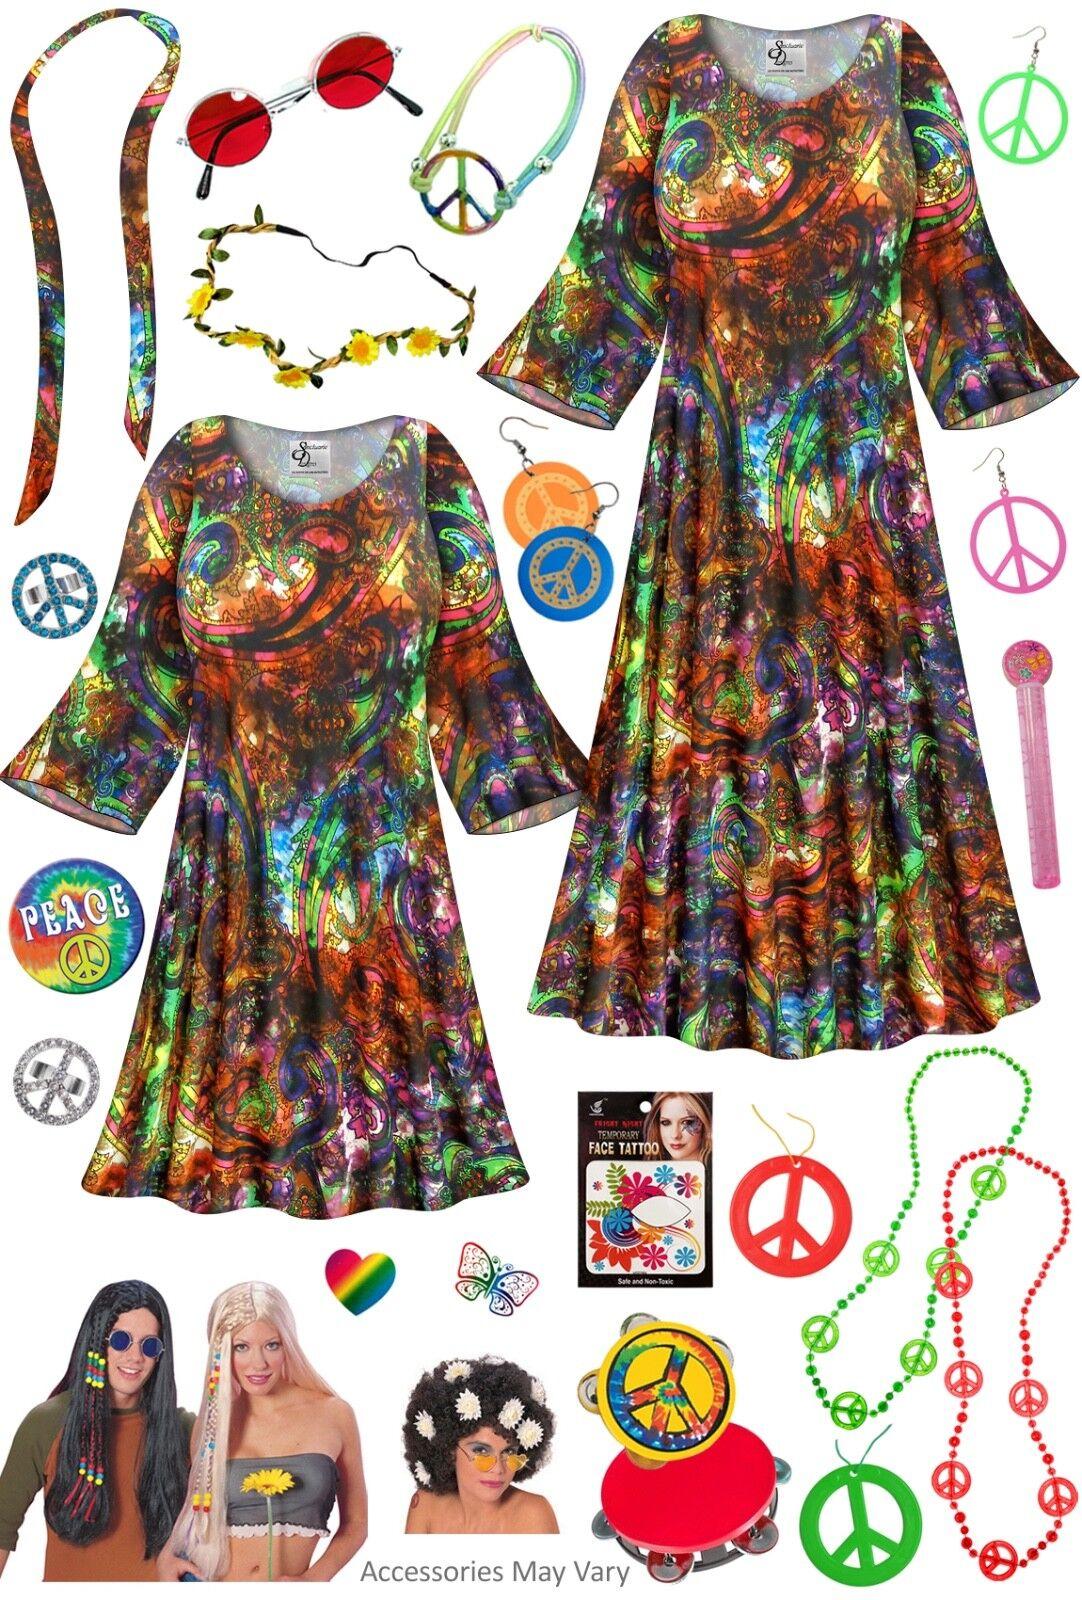 GROOVY PAISLEY PLUS Größe Hippie DRESS + Halloween Costume Lg XL 0X - 9X